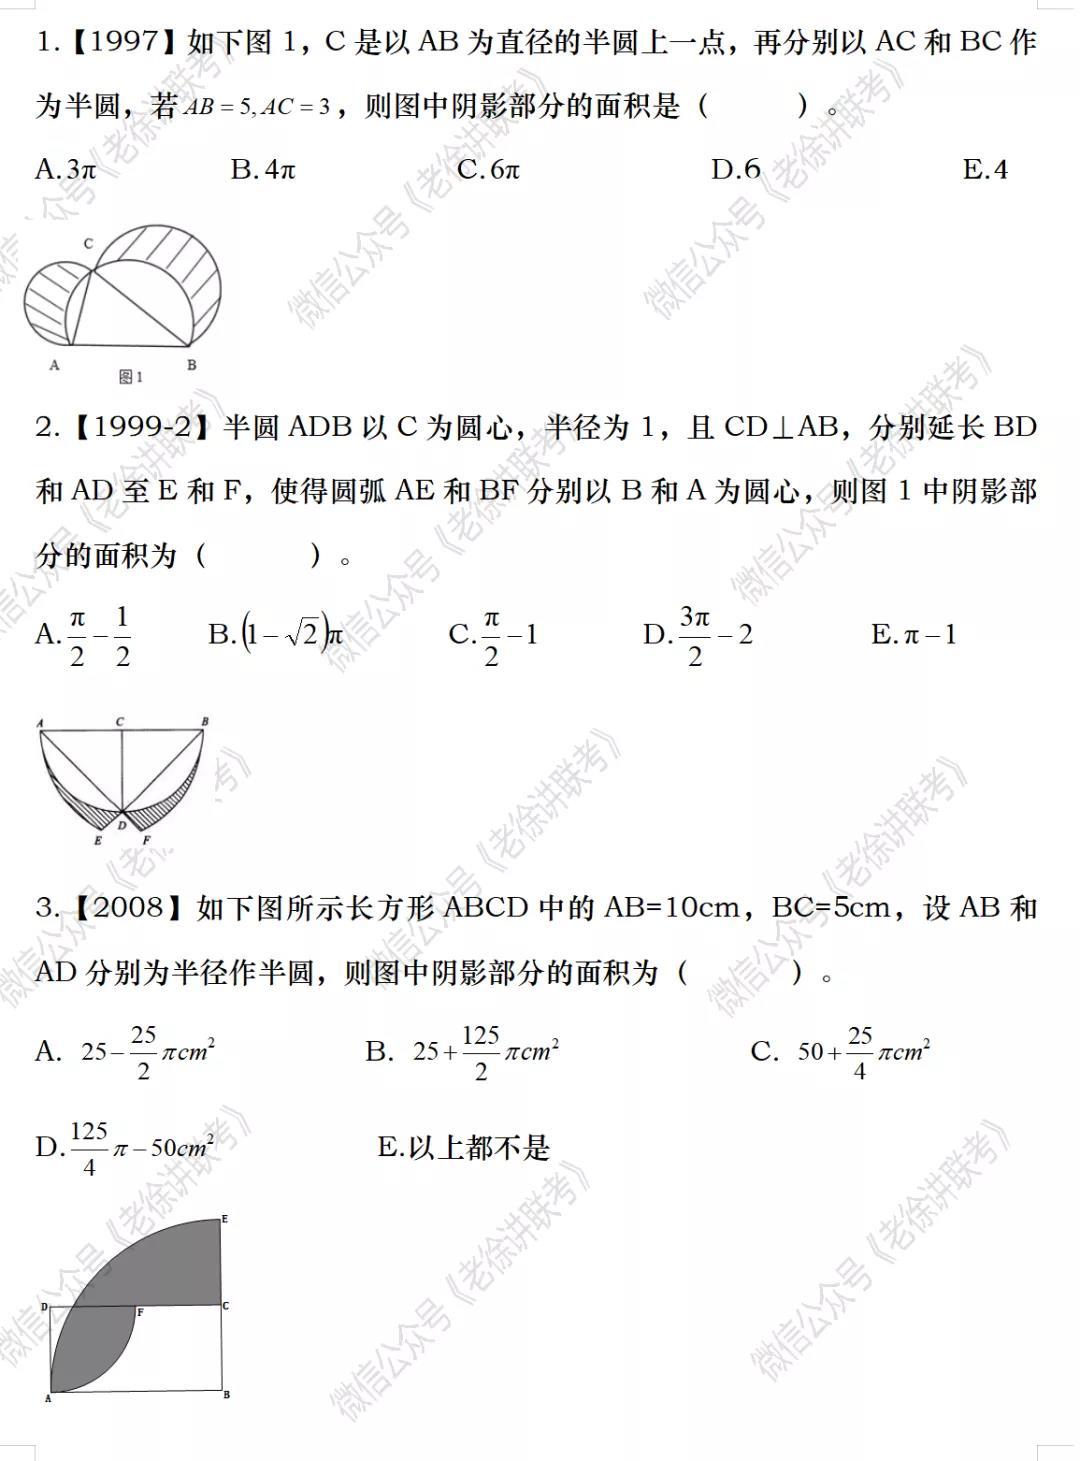 2022MBA考研|管理类联考:数学专题训练--组合图形阴影部分的面积(第一期)